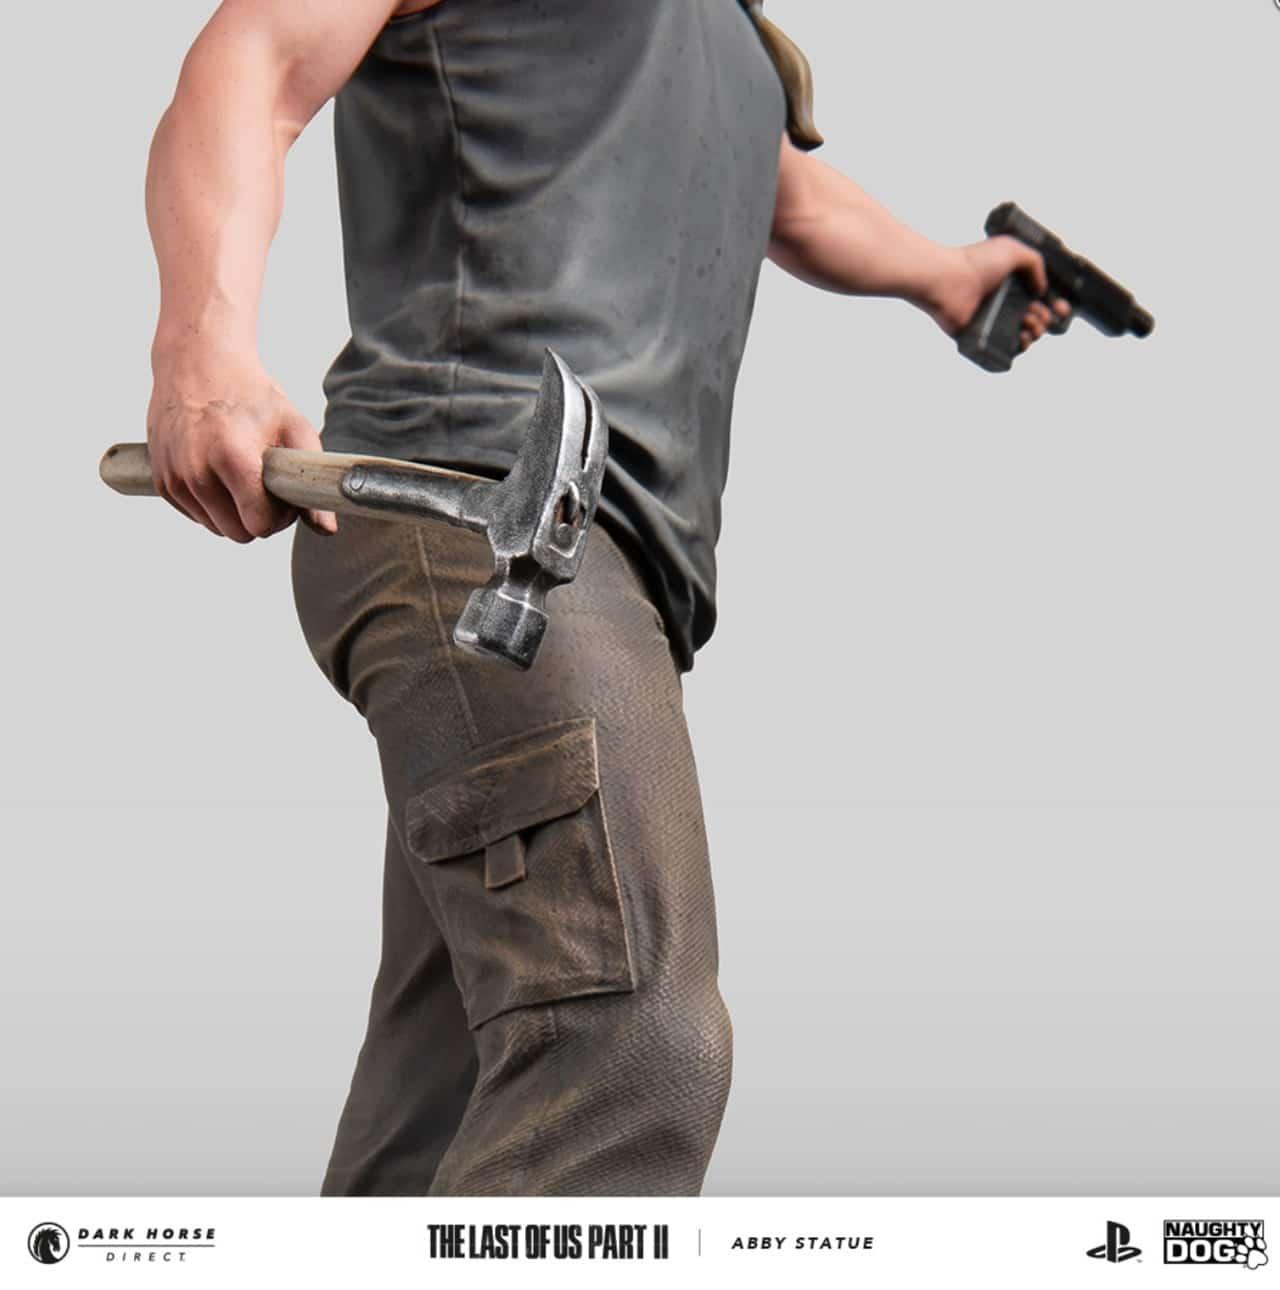 Estatueta de Abby, de The Last of Us 2.